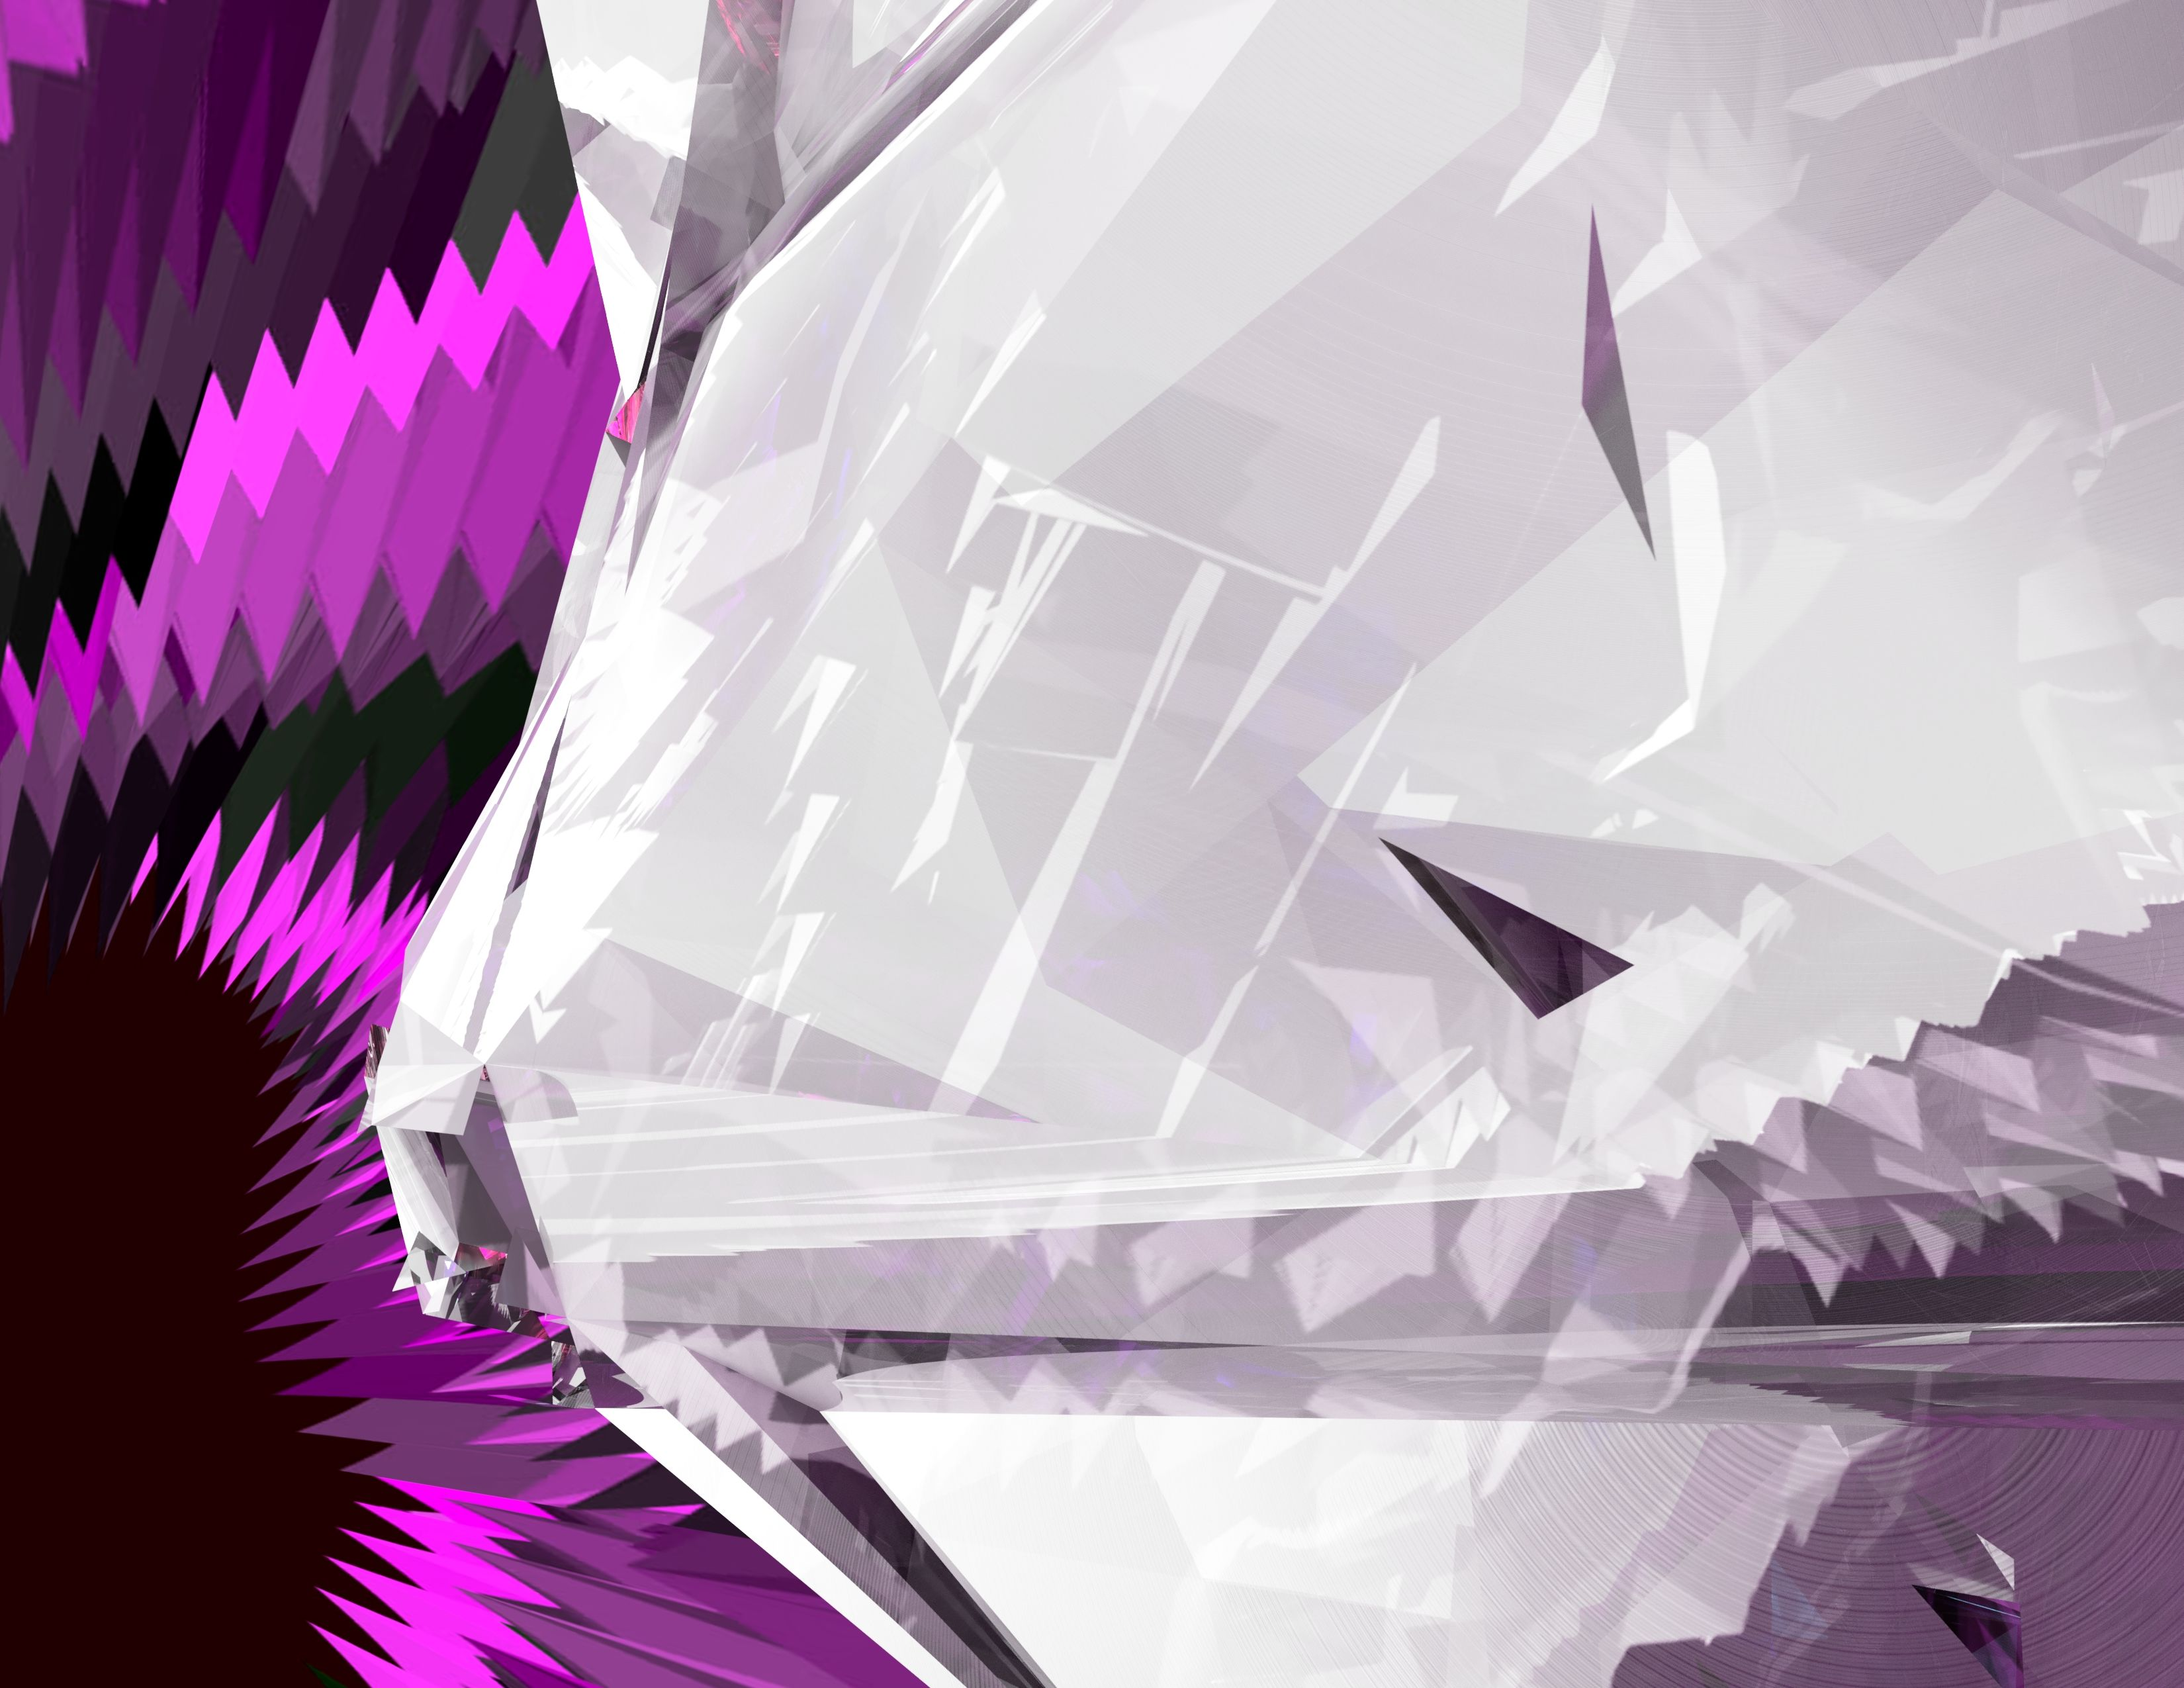 Raasrendering-640ed2c3-a972-40dc-ac3c-4491aa6c8827-3500-3500